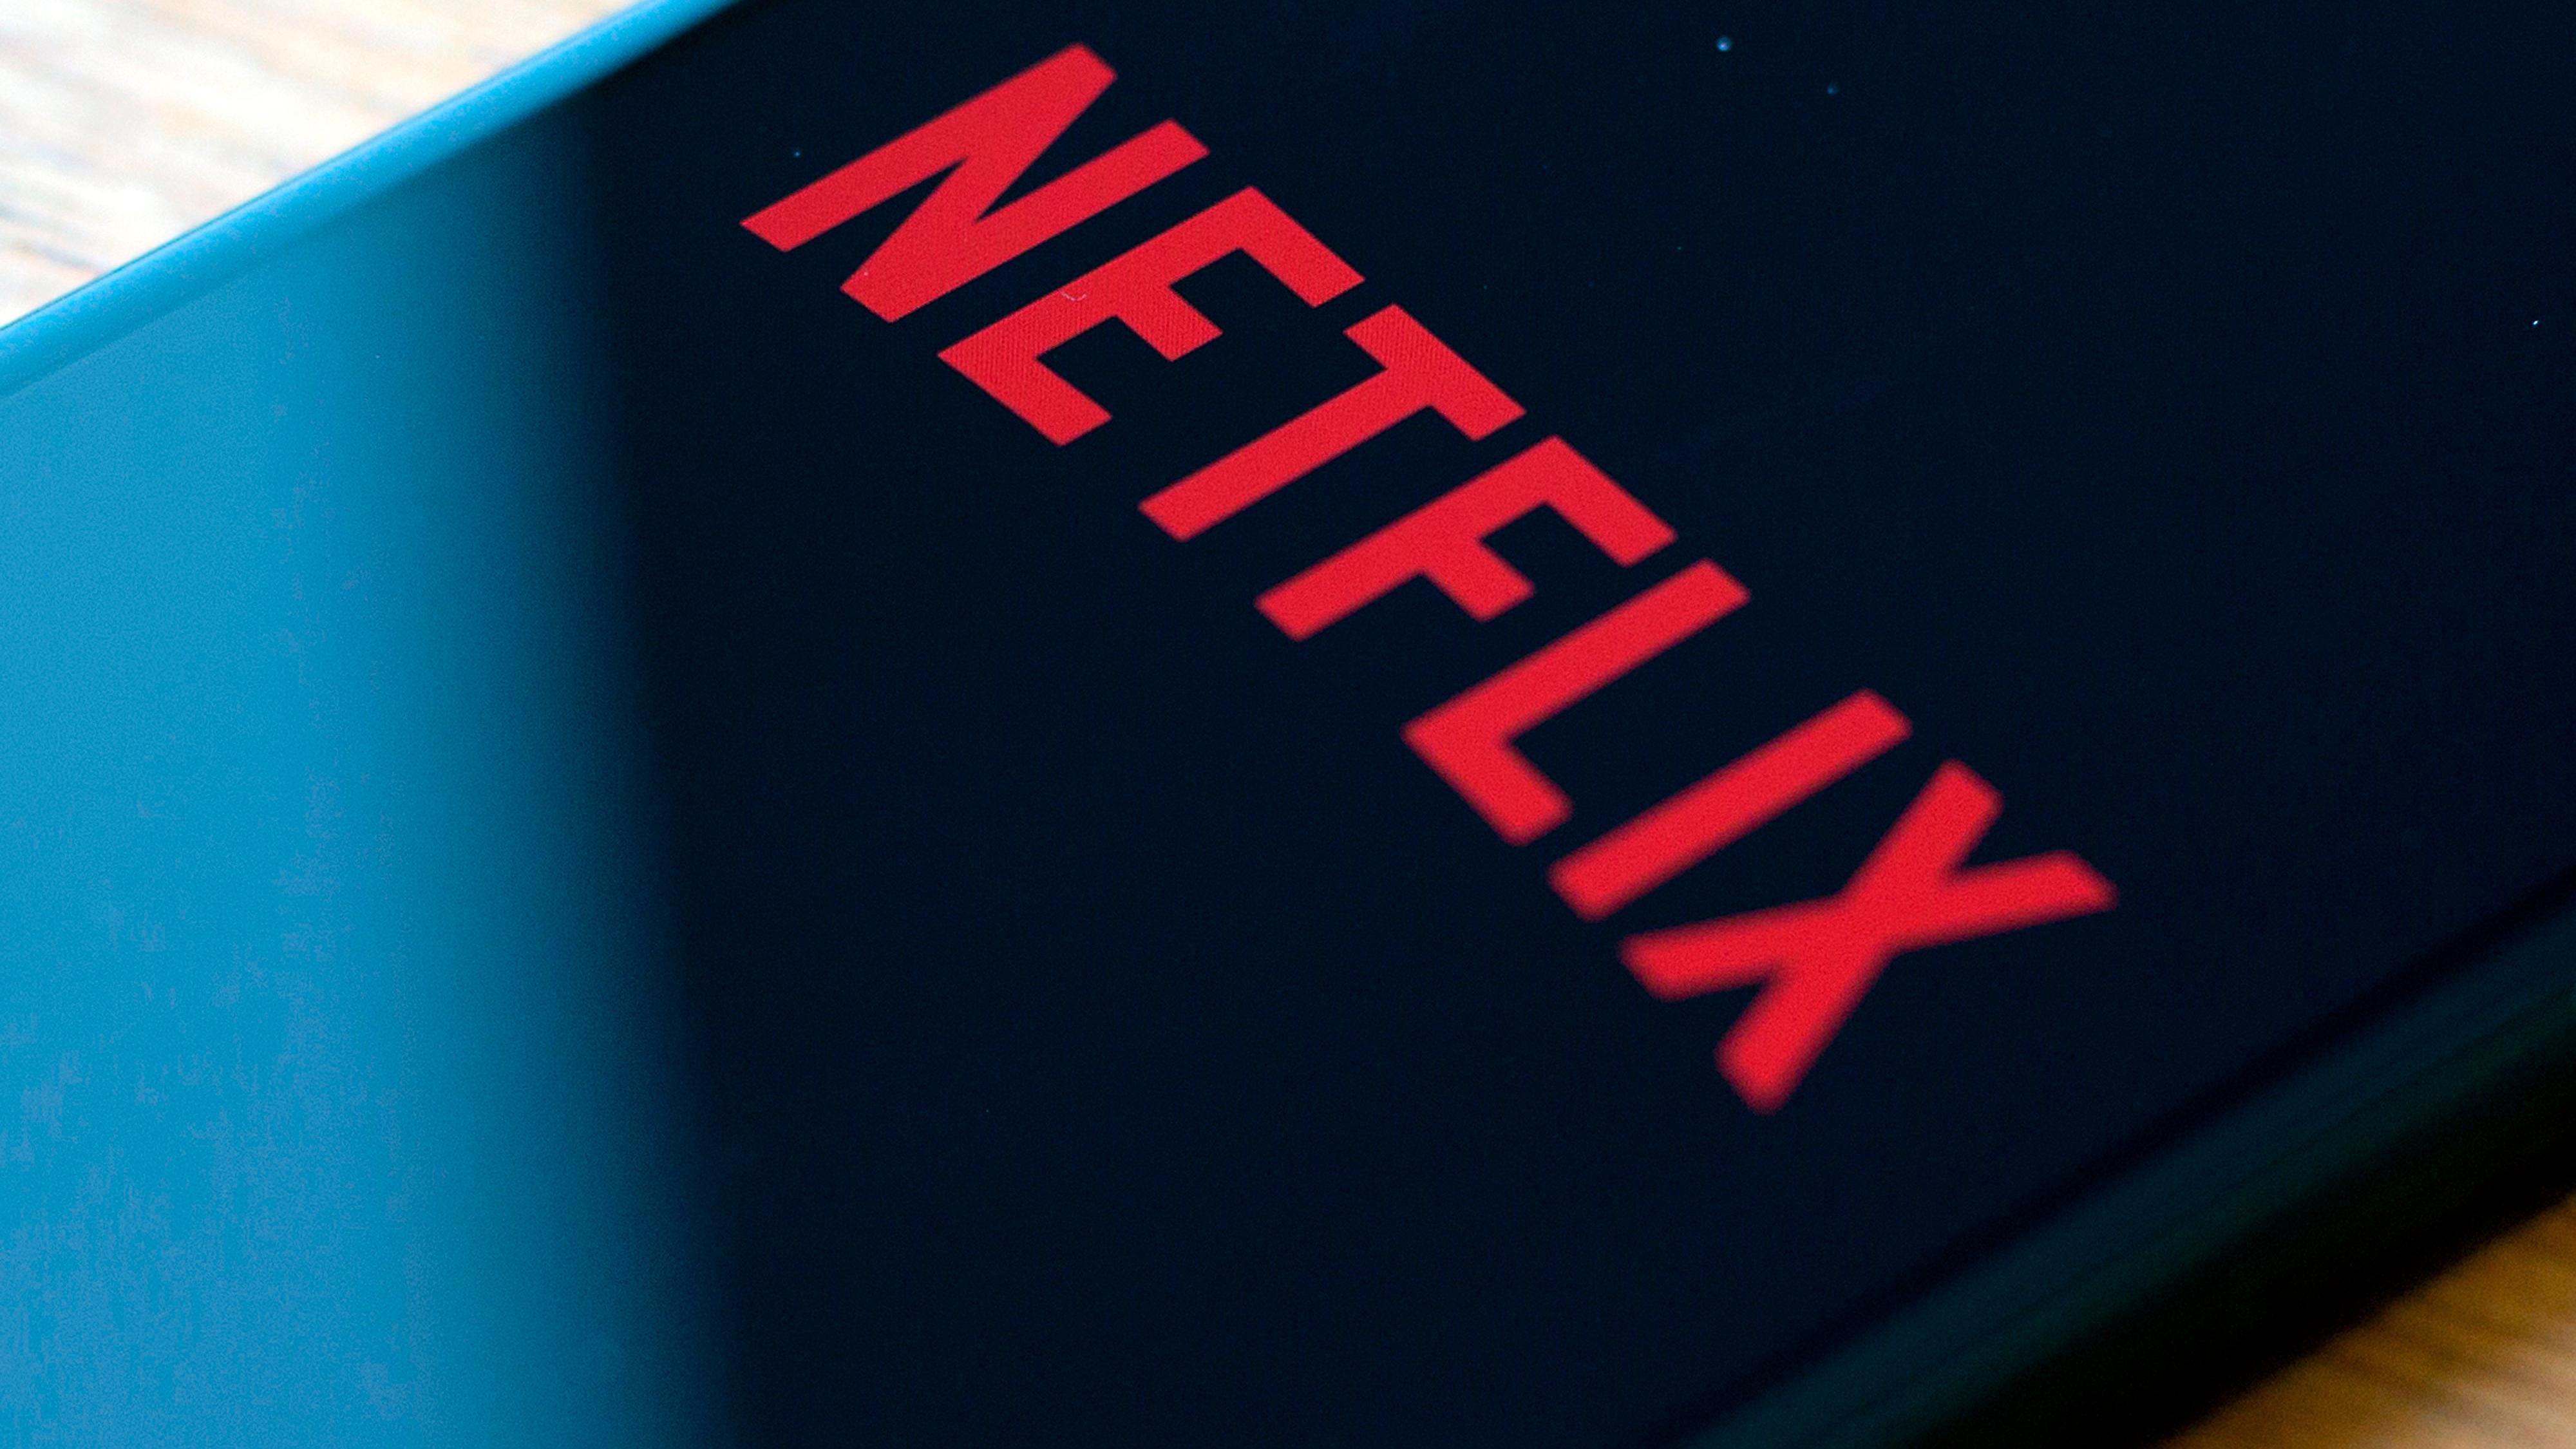 Netflix dropper prøveperiode i Norge